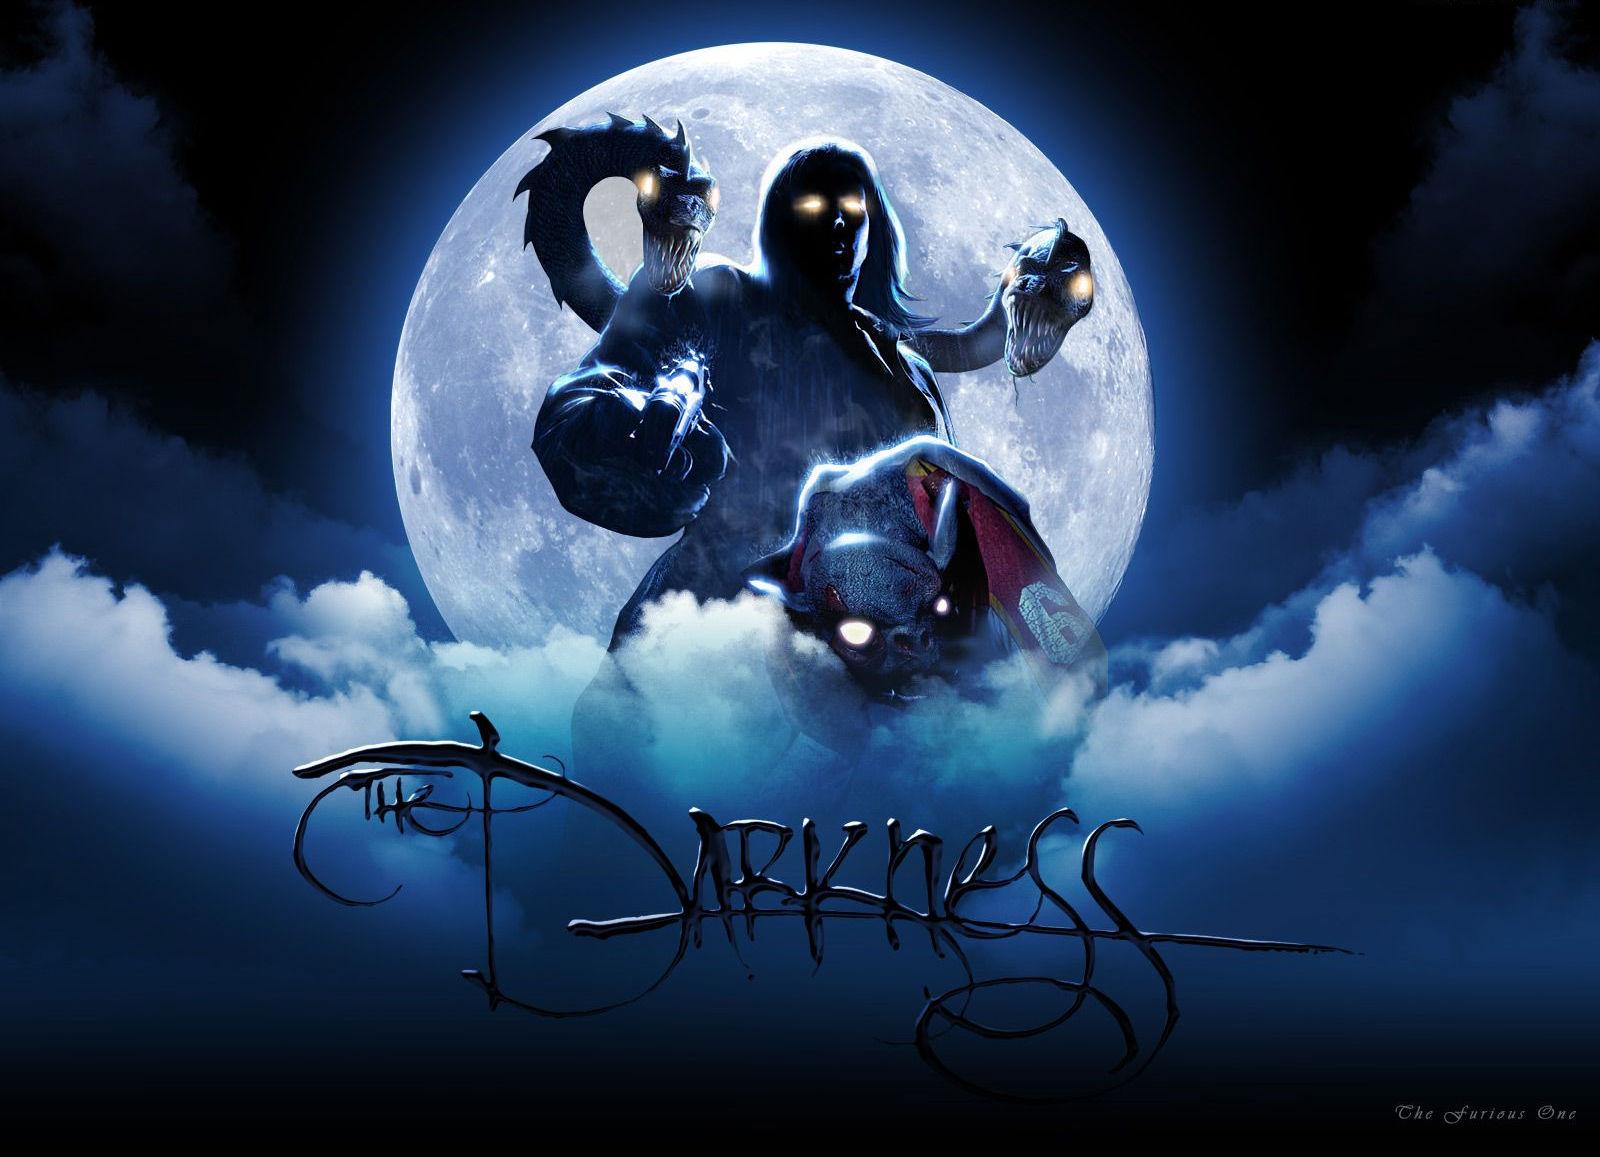 Hd wallpaper darkness - Hd Wallpaper Darkness 51